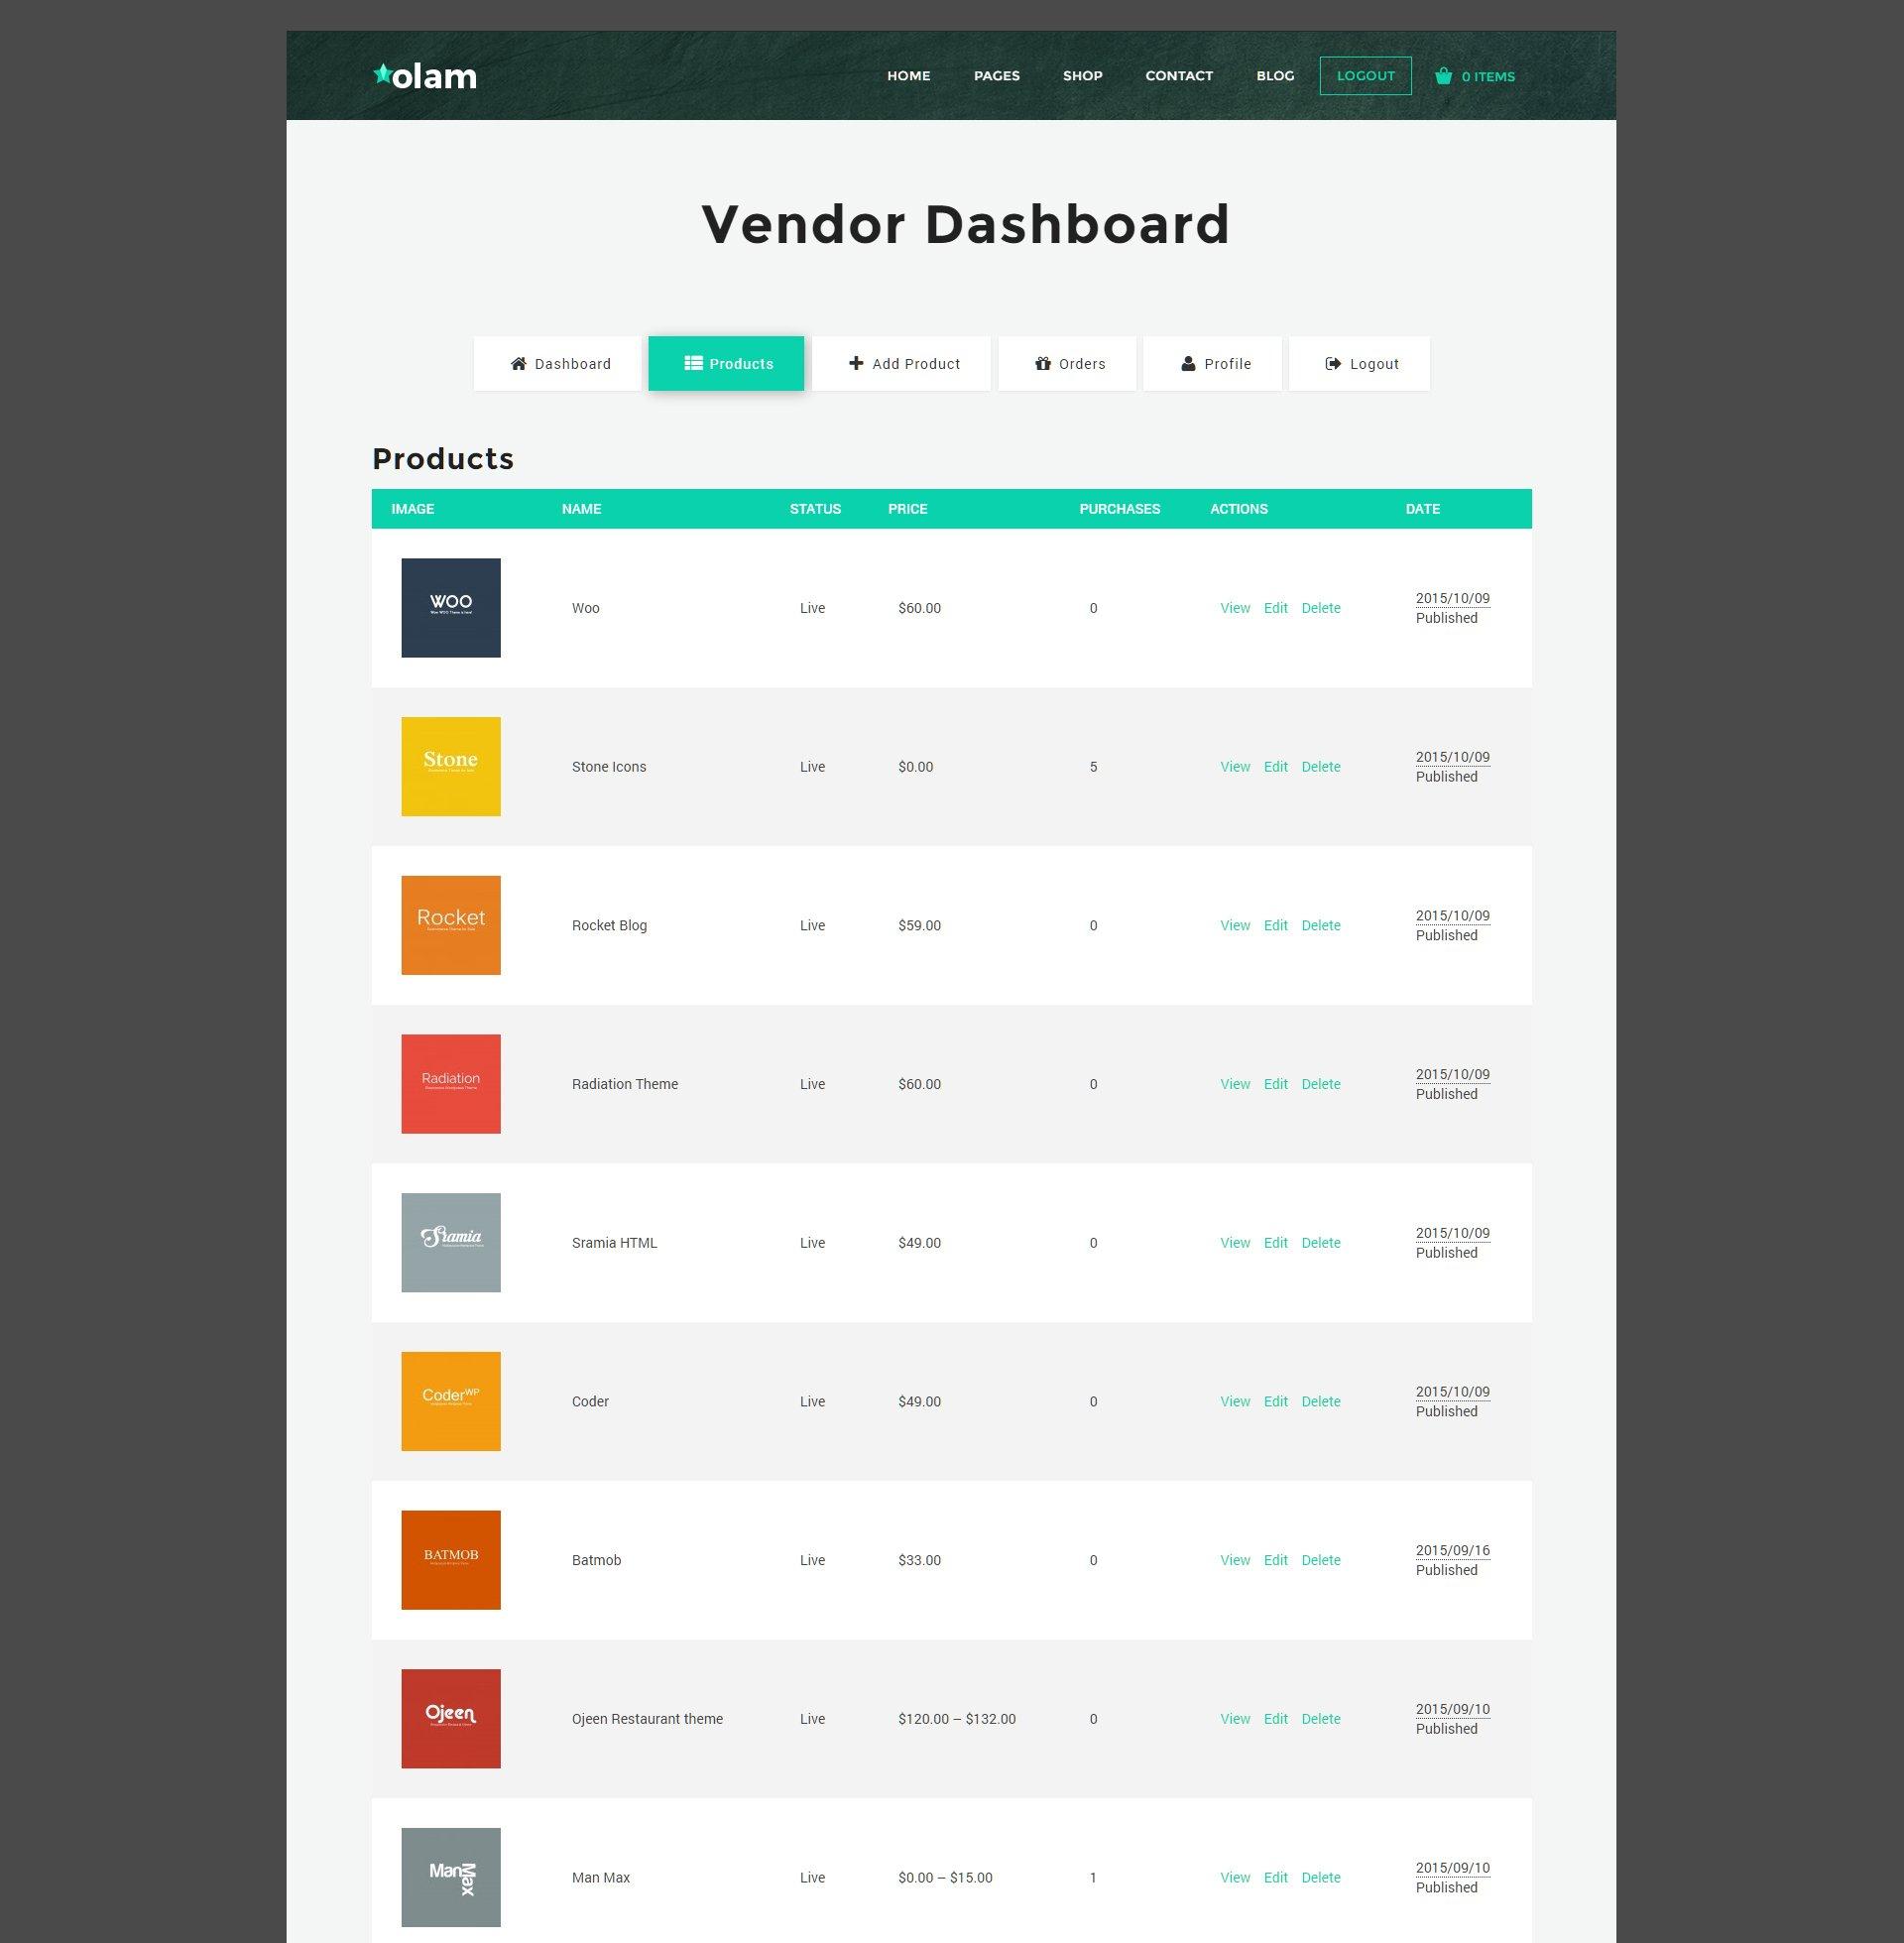 7 vendor-products